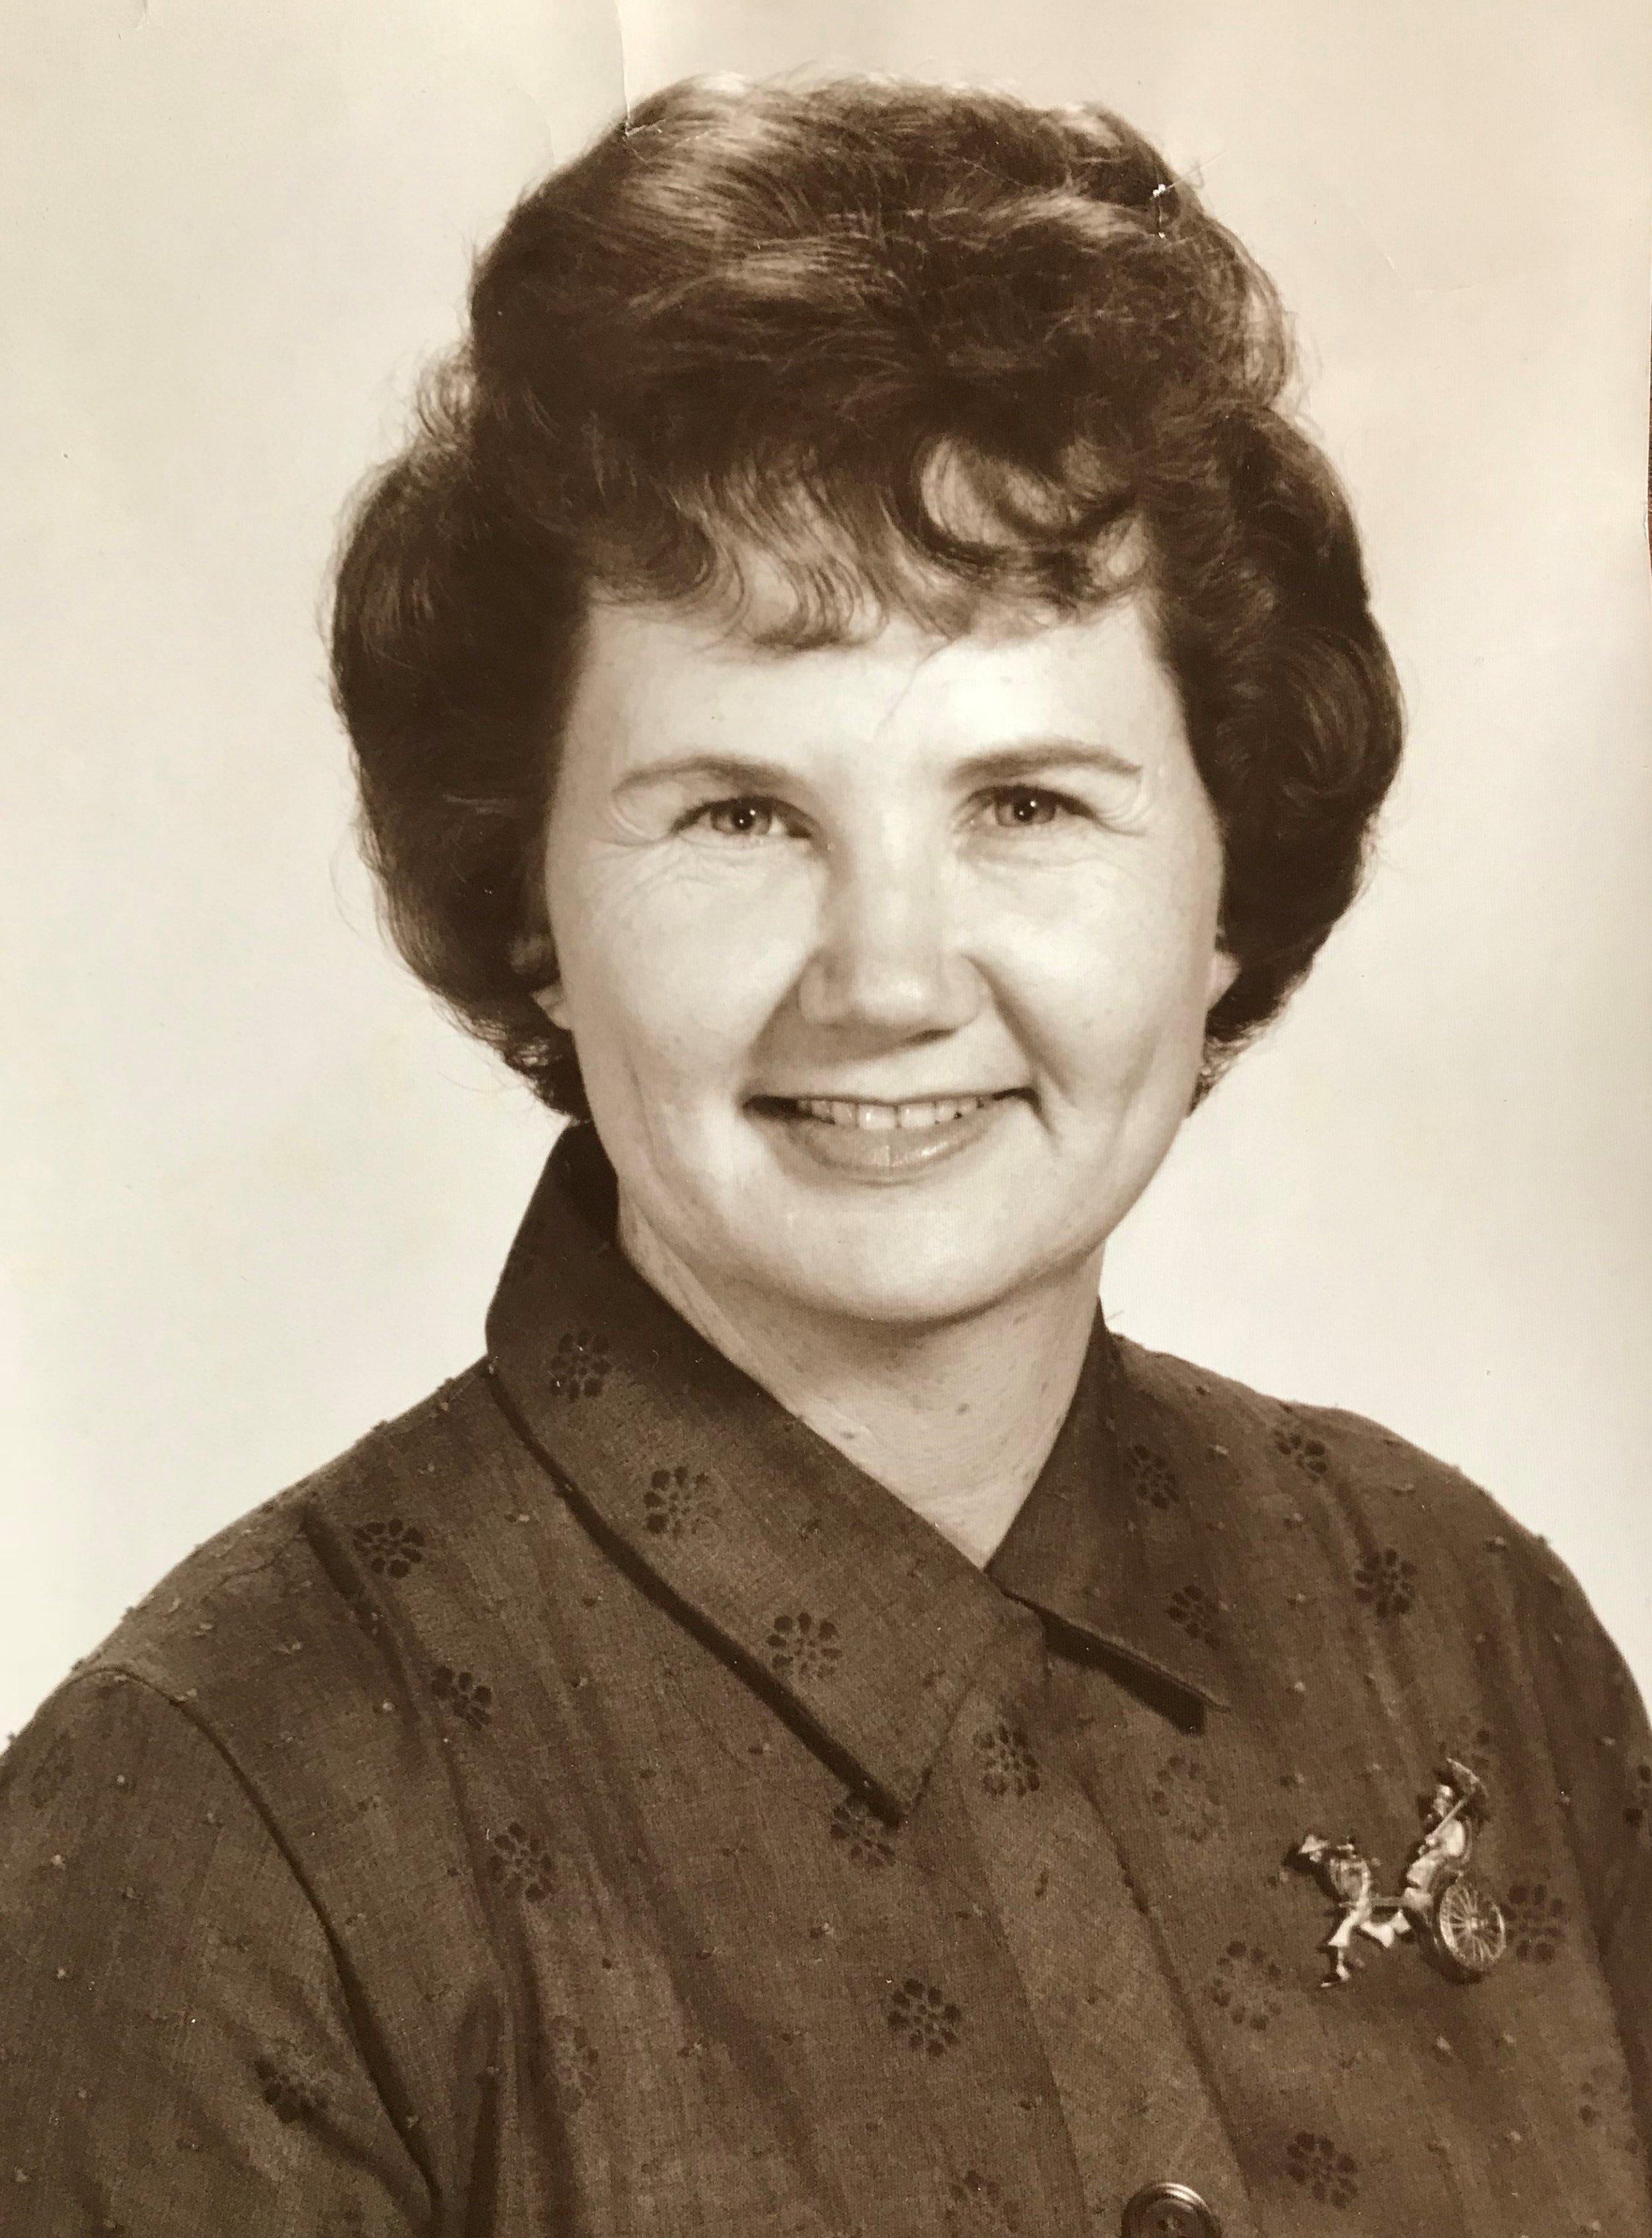 Mark-Johnson-Mother-Irene-Johnson-St-Tammany-Parish-School-System-Lee-Road-Covington-Elementary-Covington-Middle-School.jpg